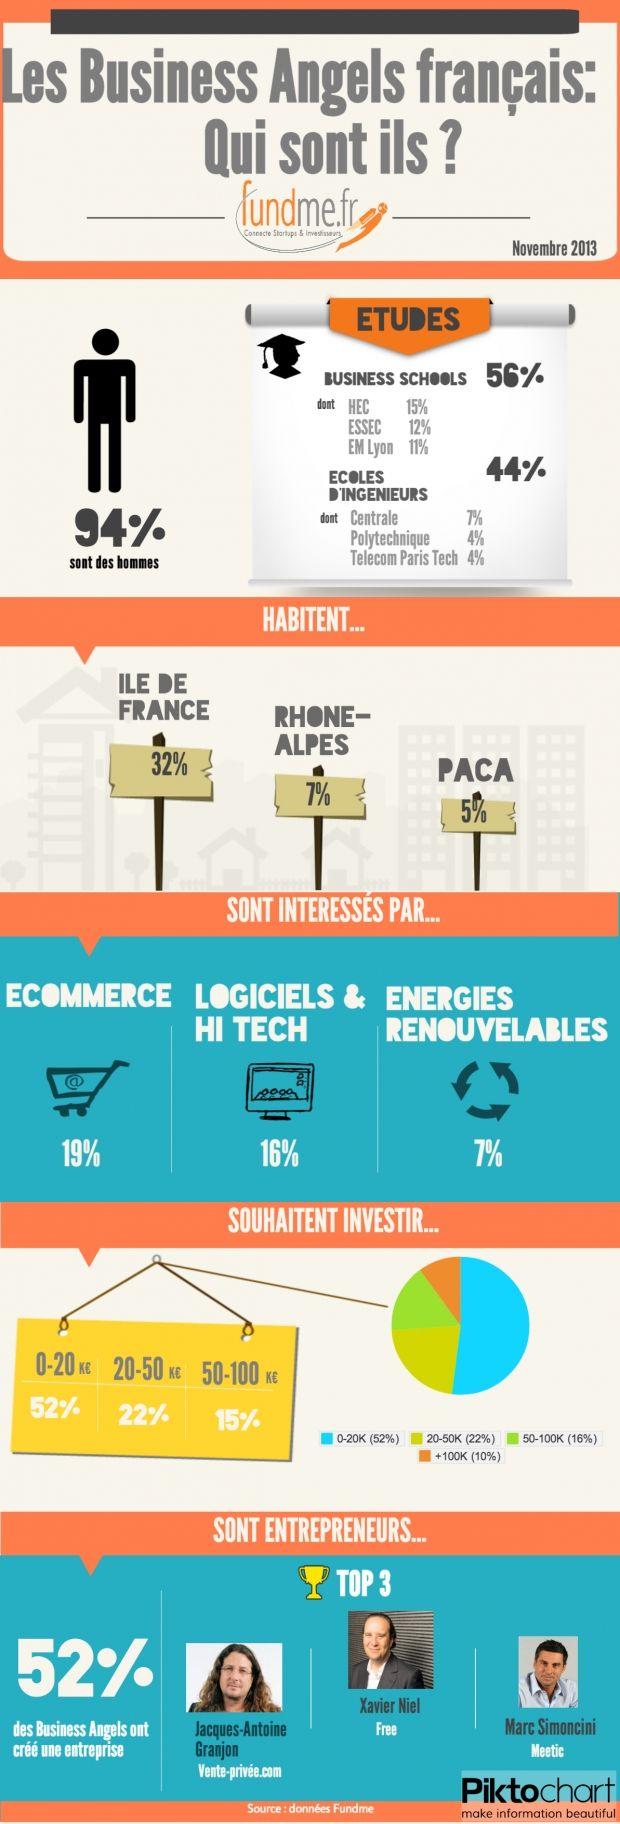 Infographie Fundme - Les Business Angels français #startup